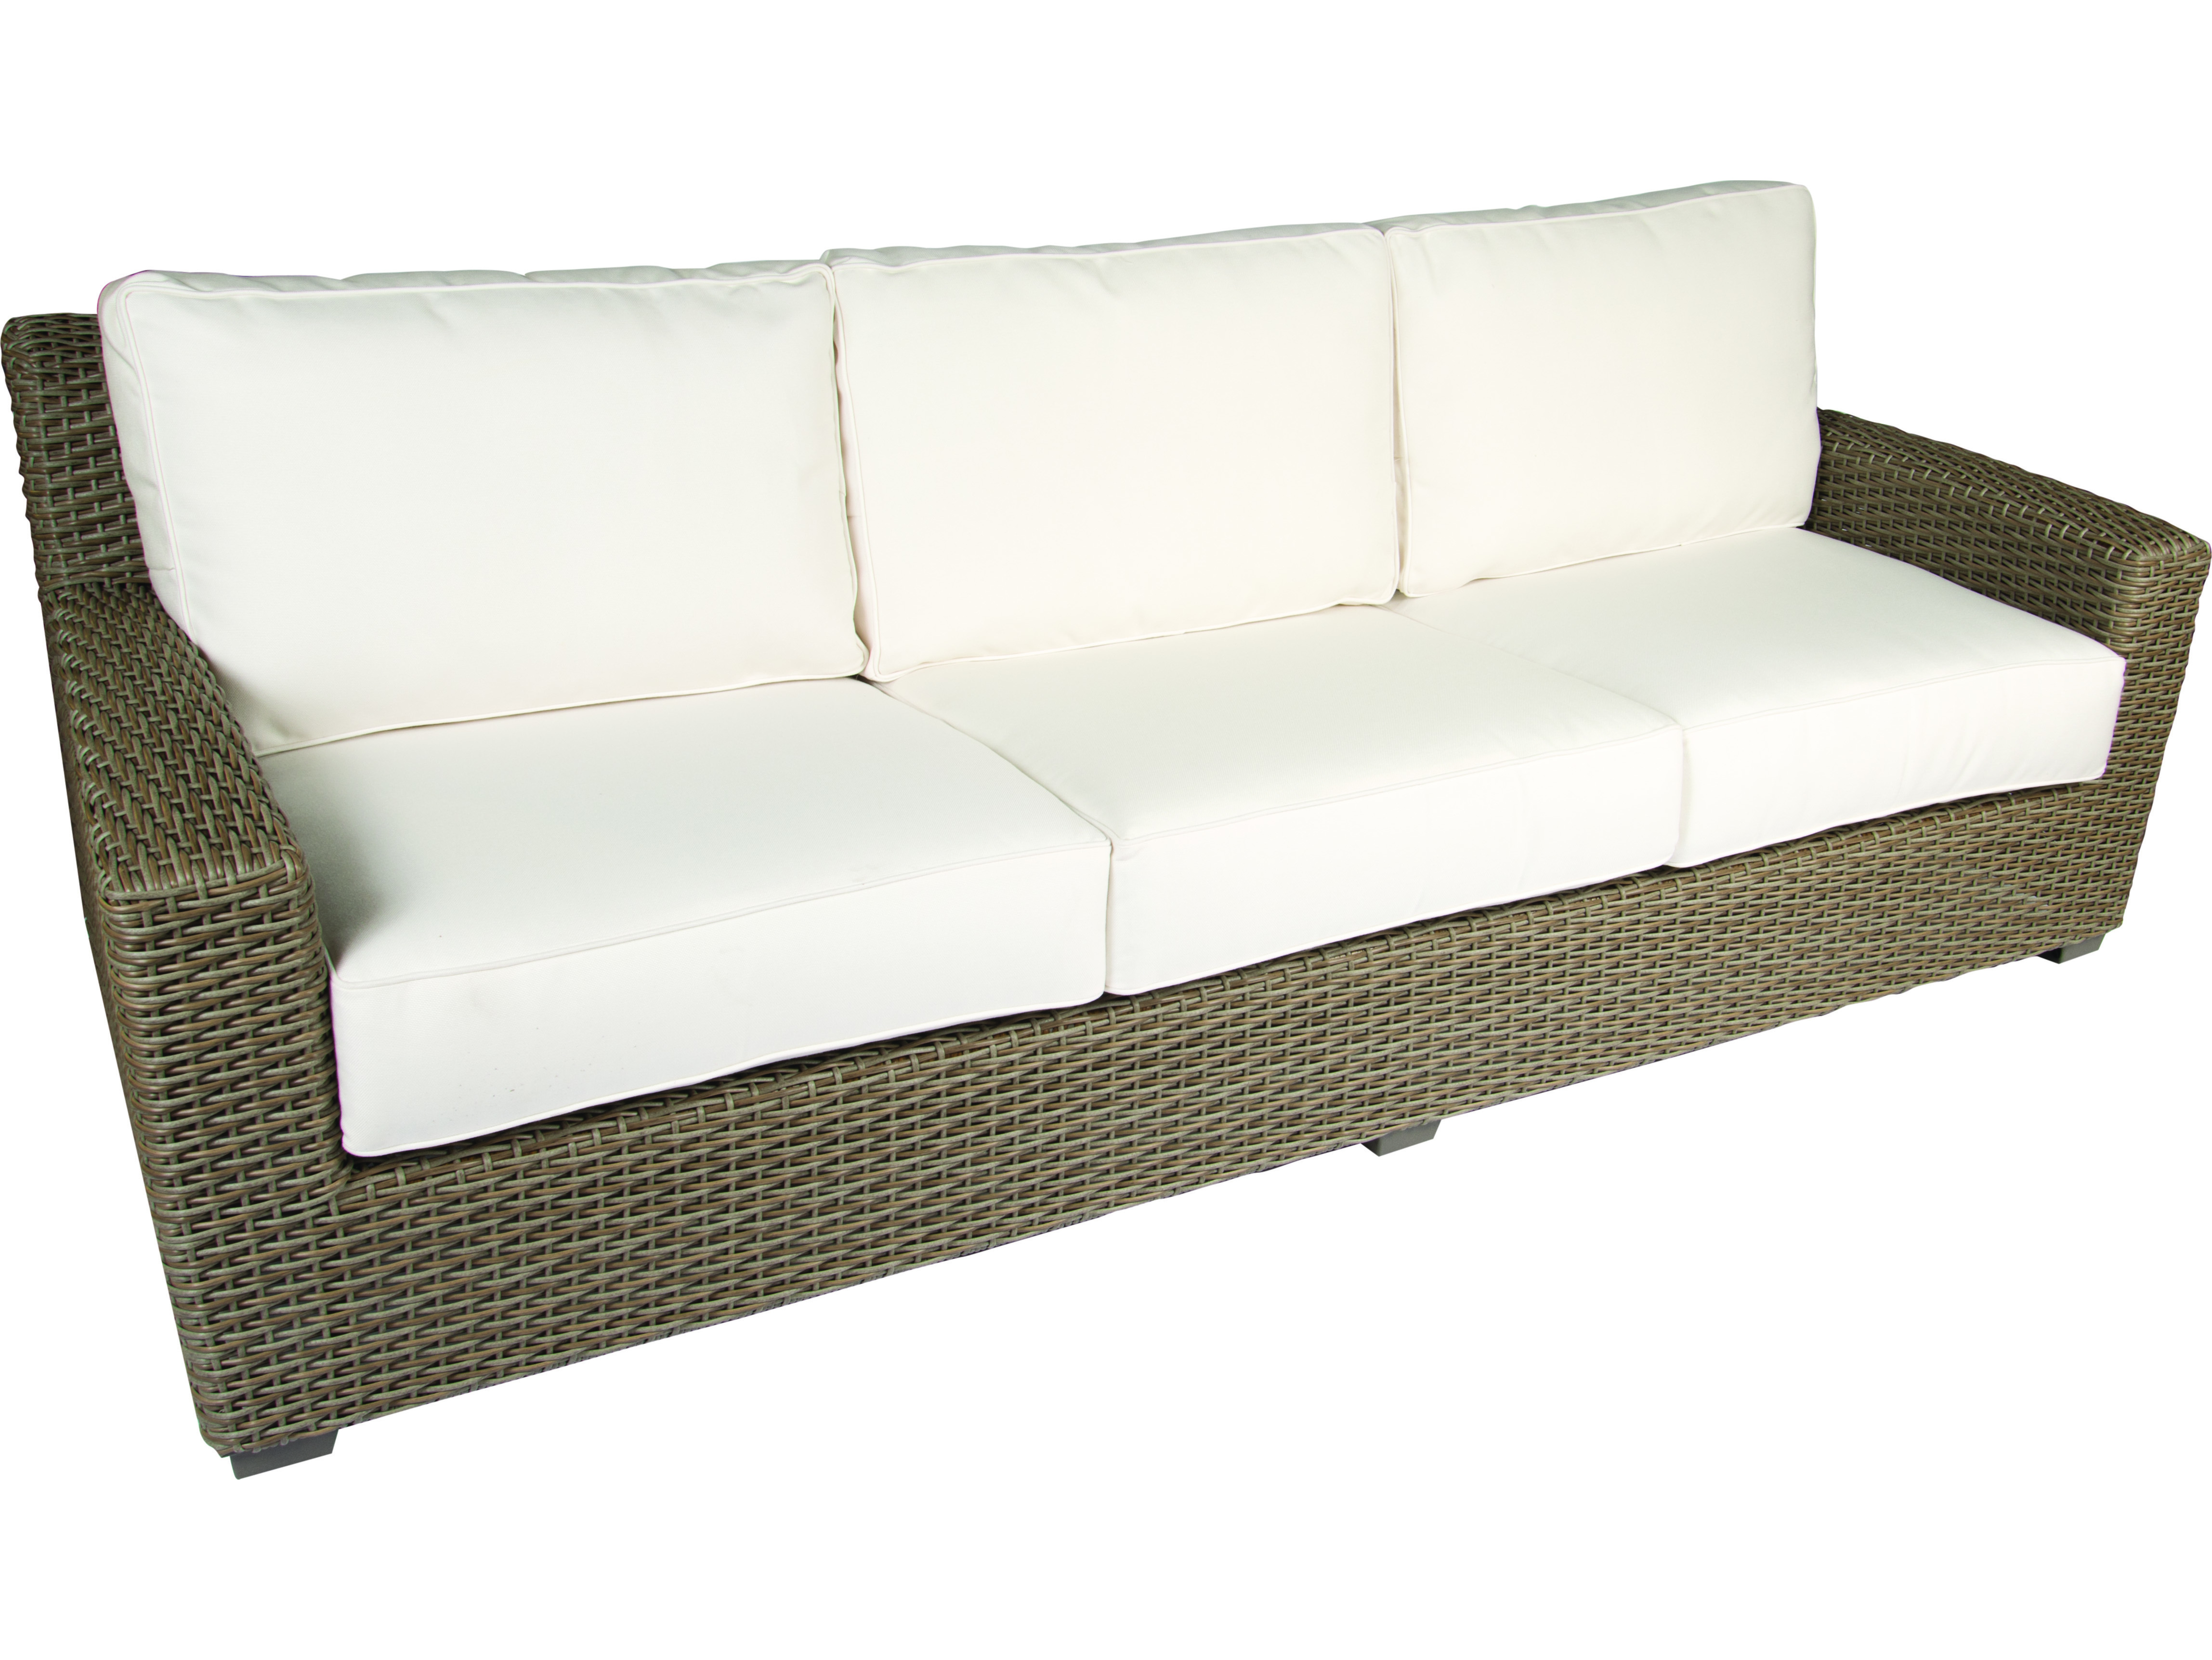 Whitecraft Augusta Wicker Cushion Sofa S592031